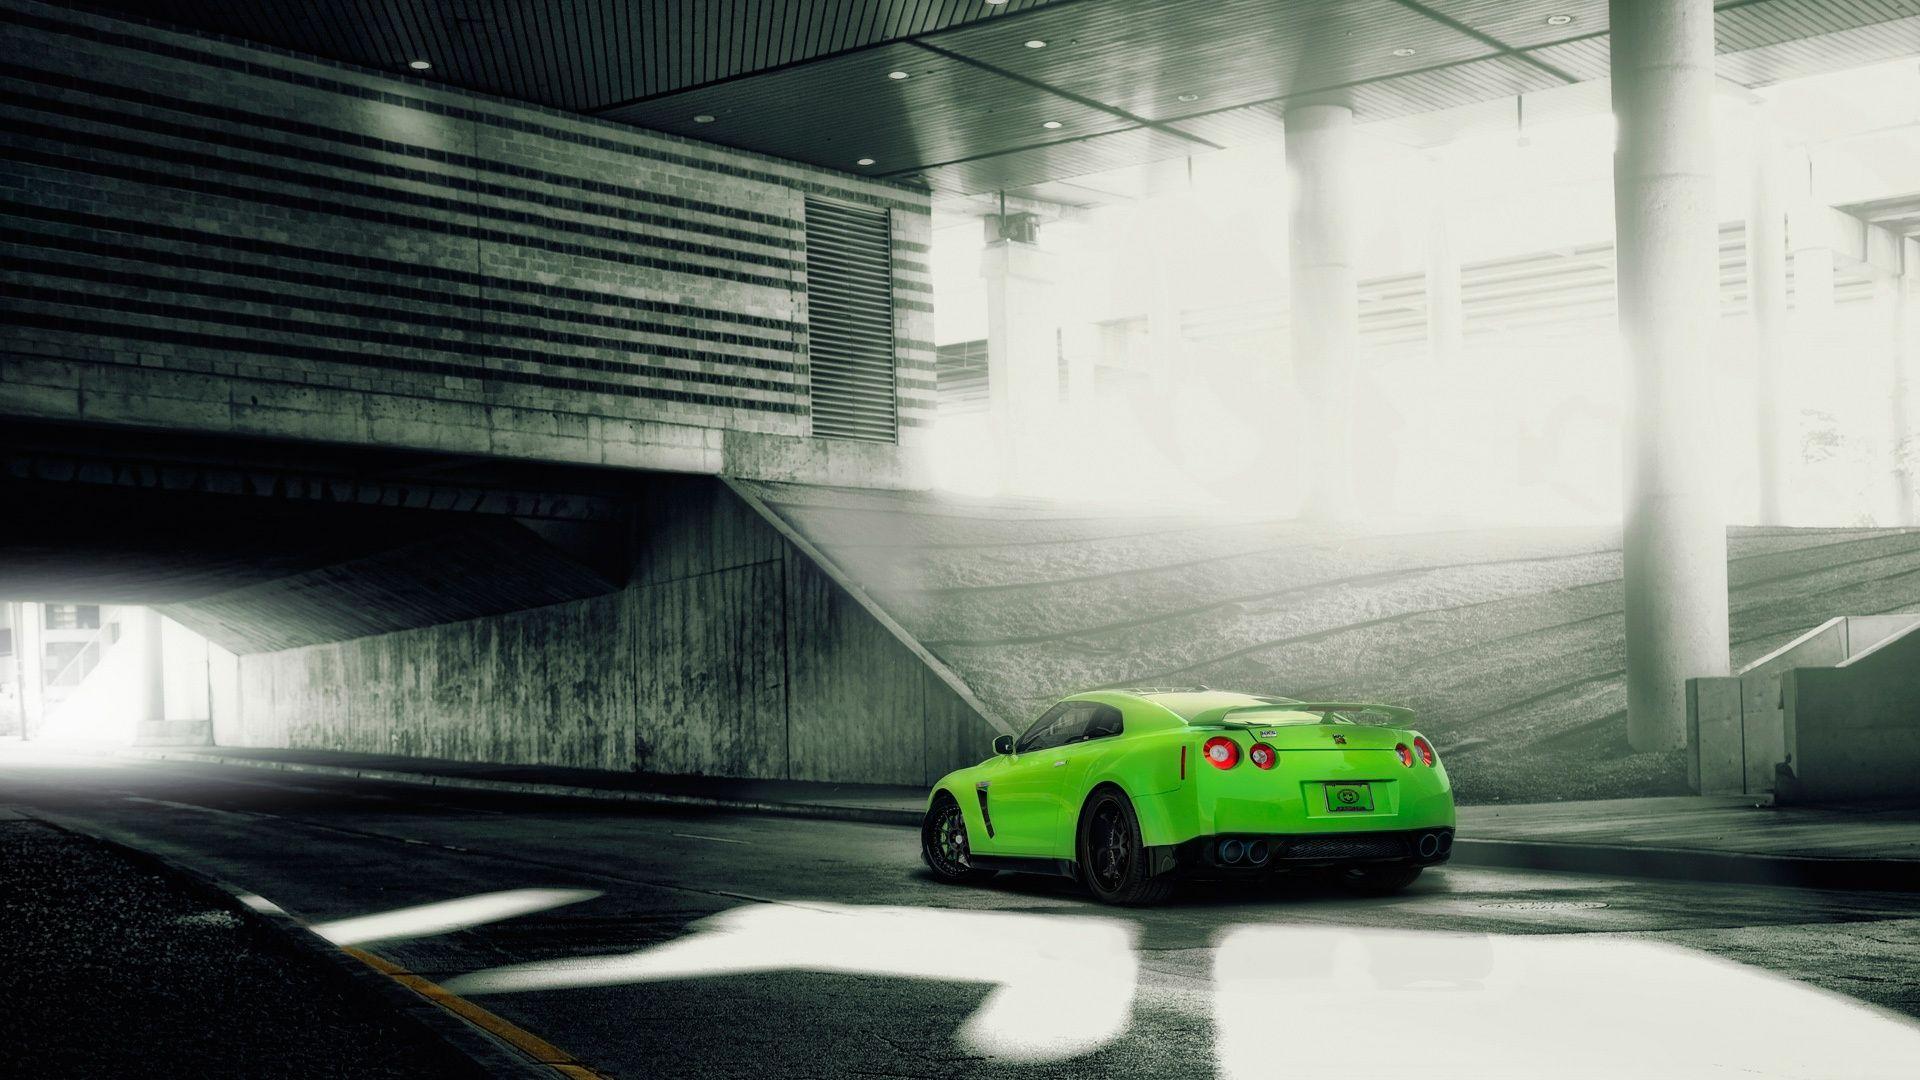 Free Green Color Nissan Gtr 1080p Wallpapers Nissan Gtr Gtr Car